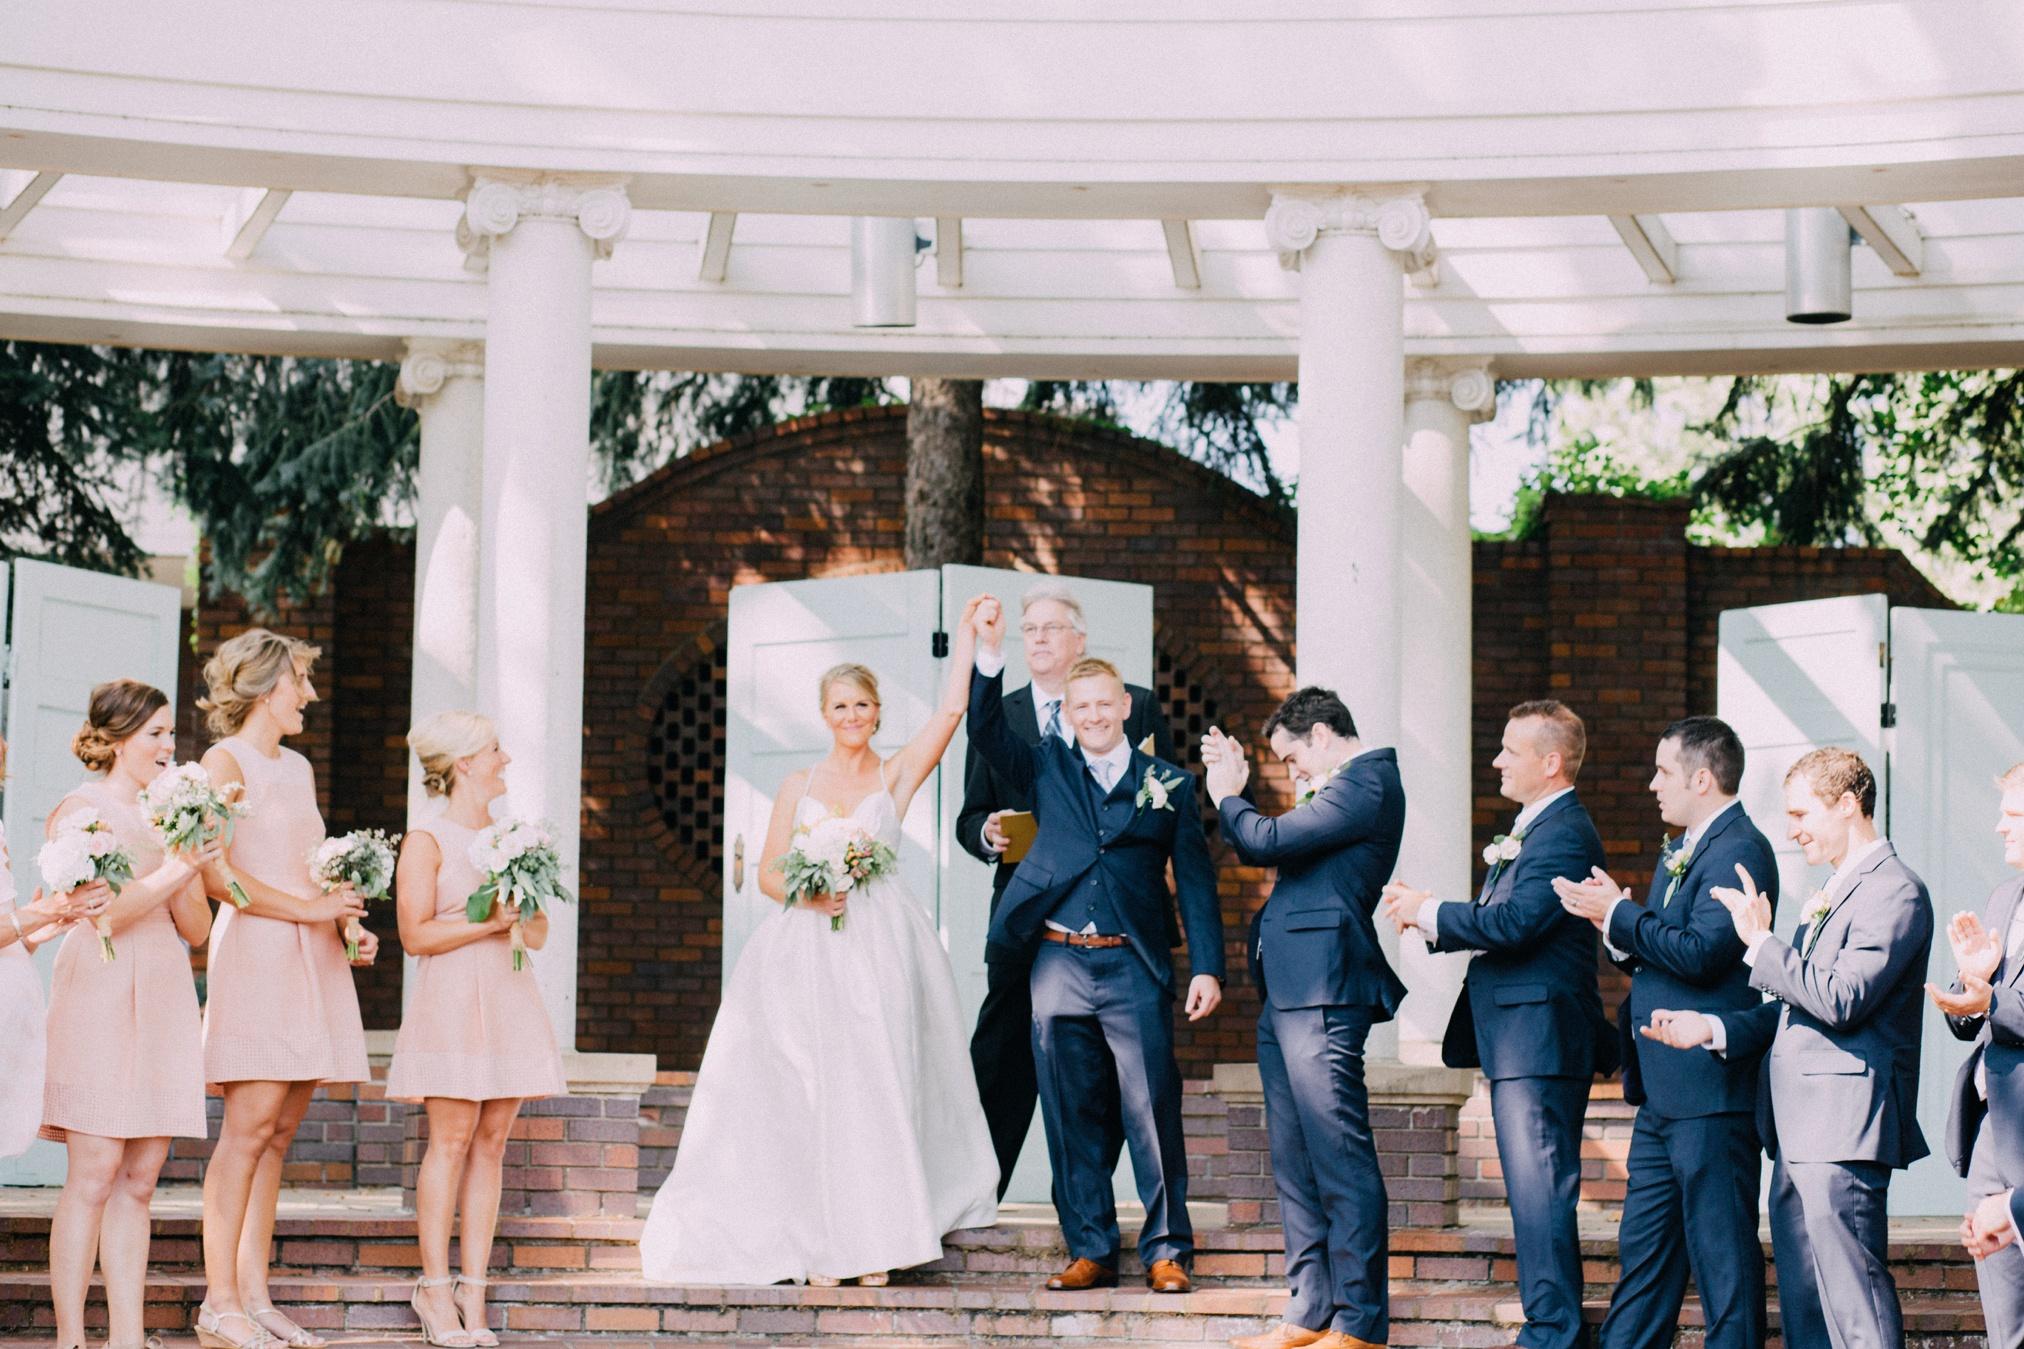 brenna+michael_wedding-445.jpg